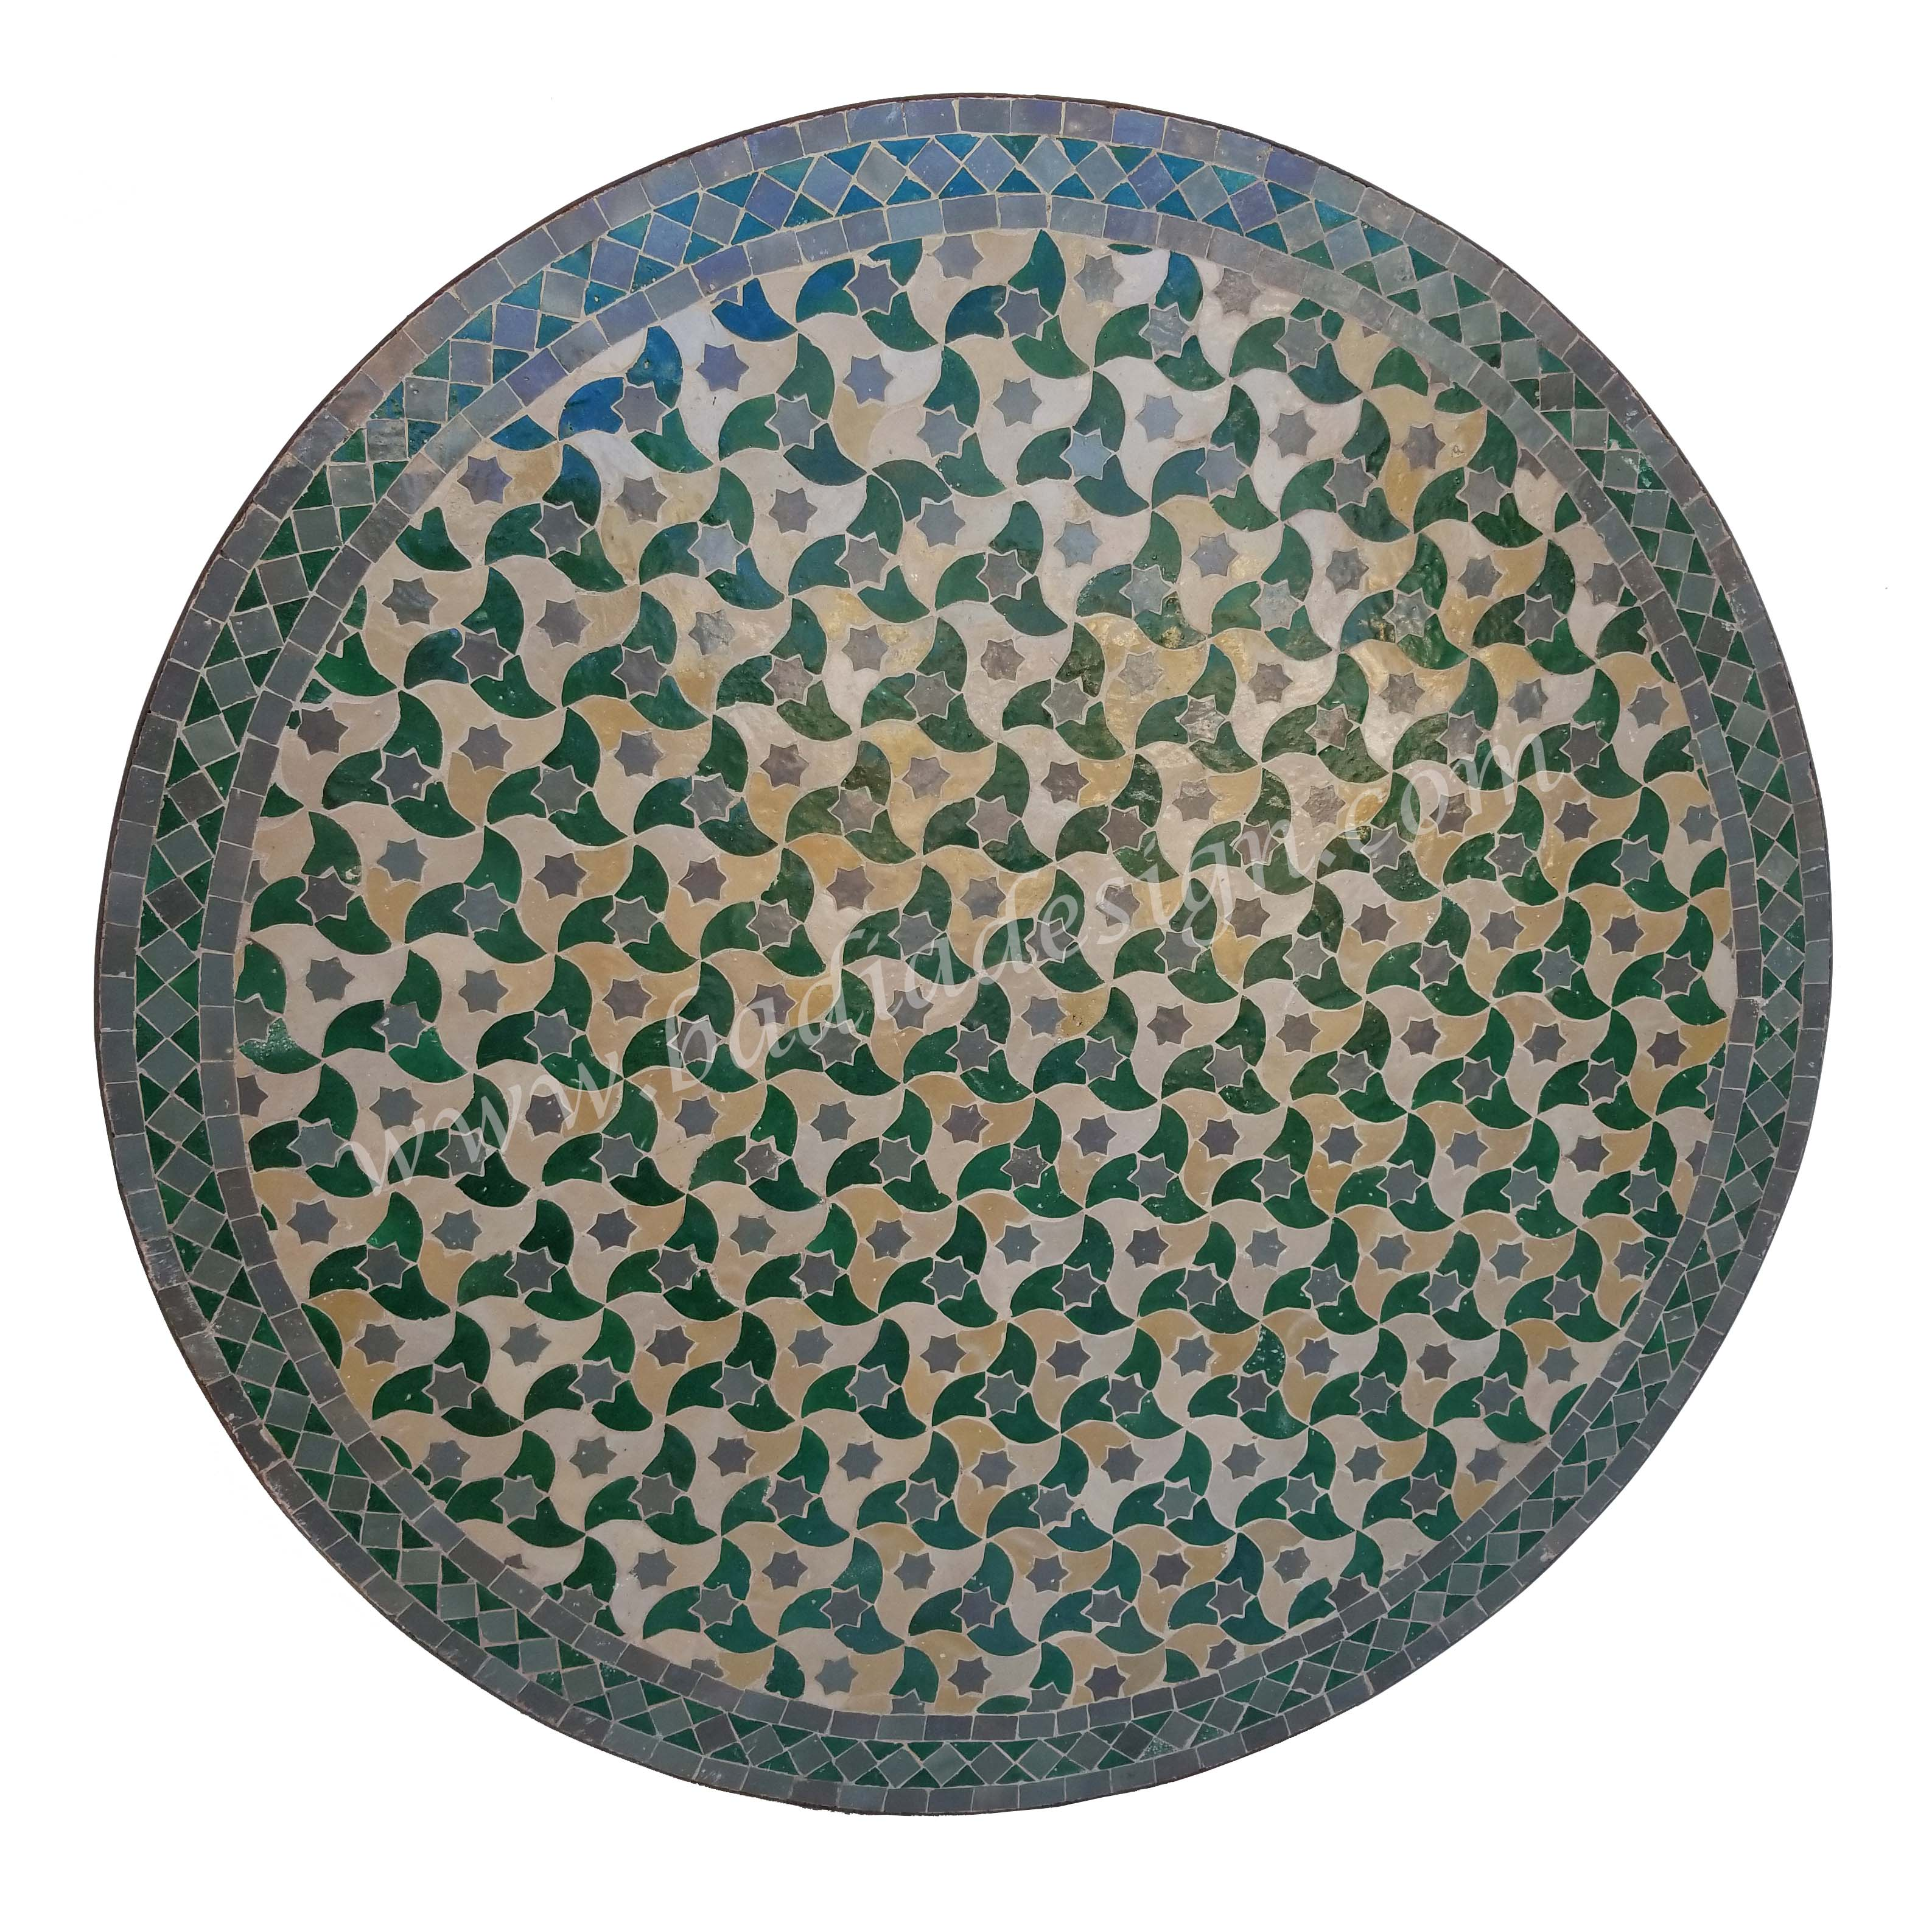 green-tile-table-top-mtr423.jpg